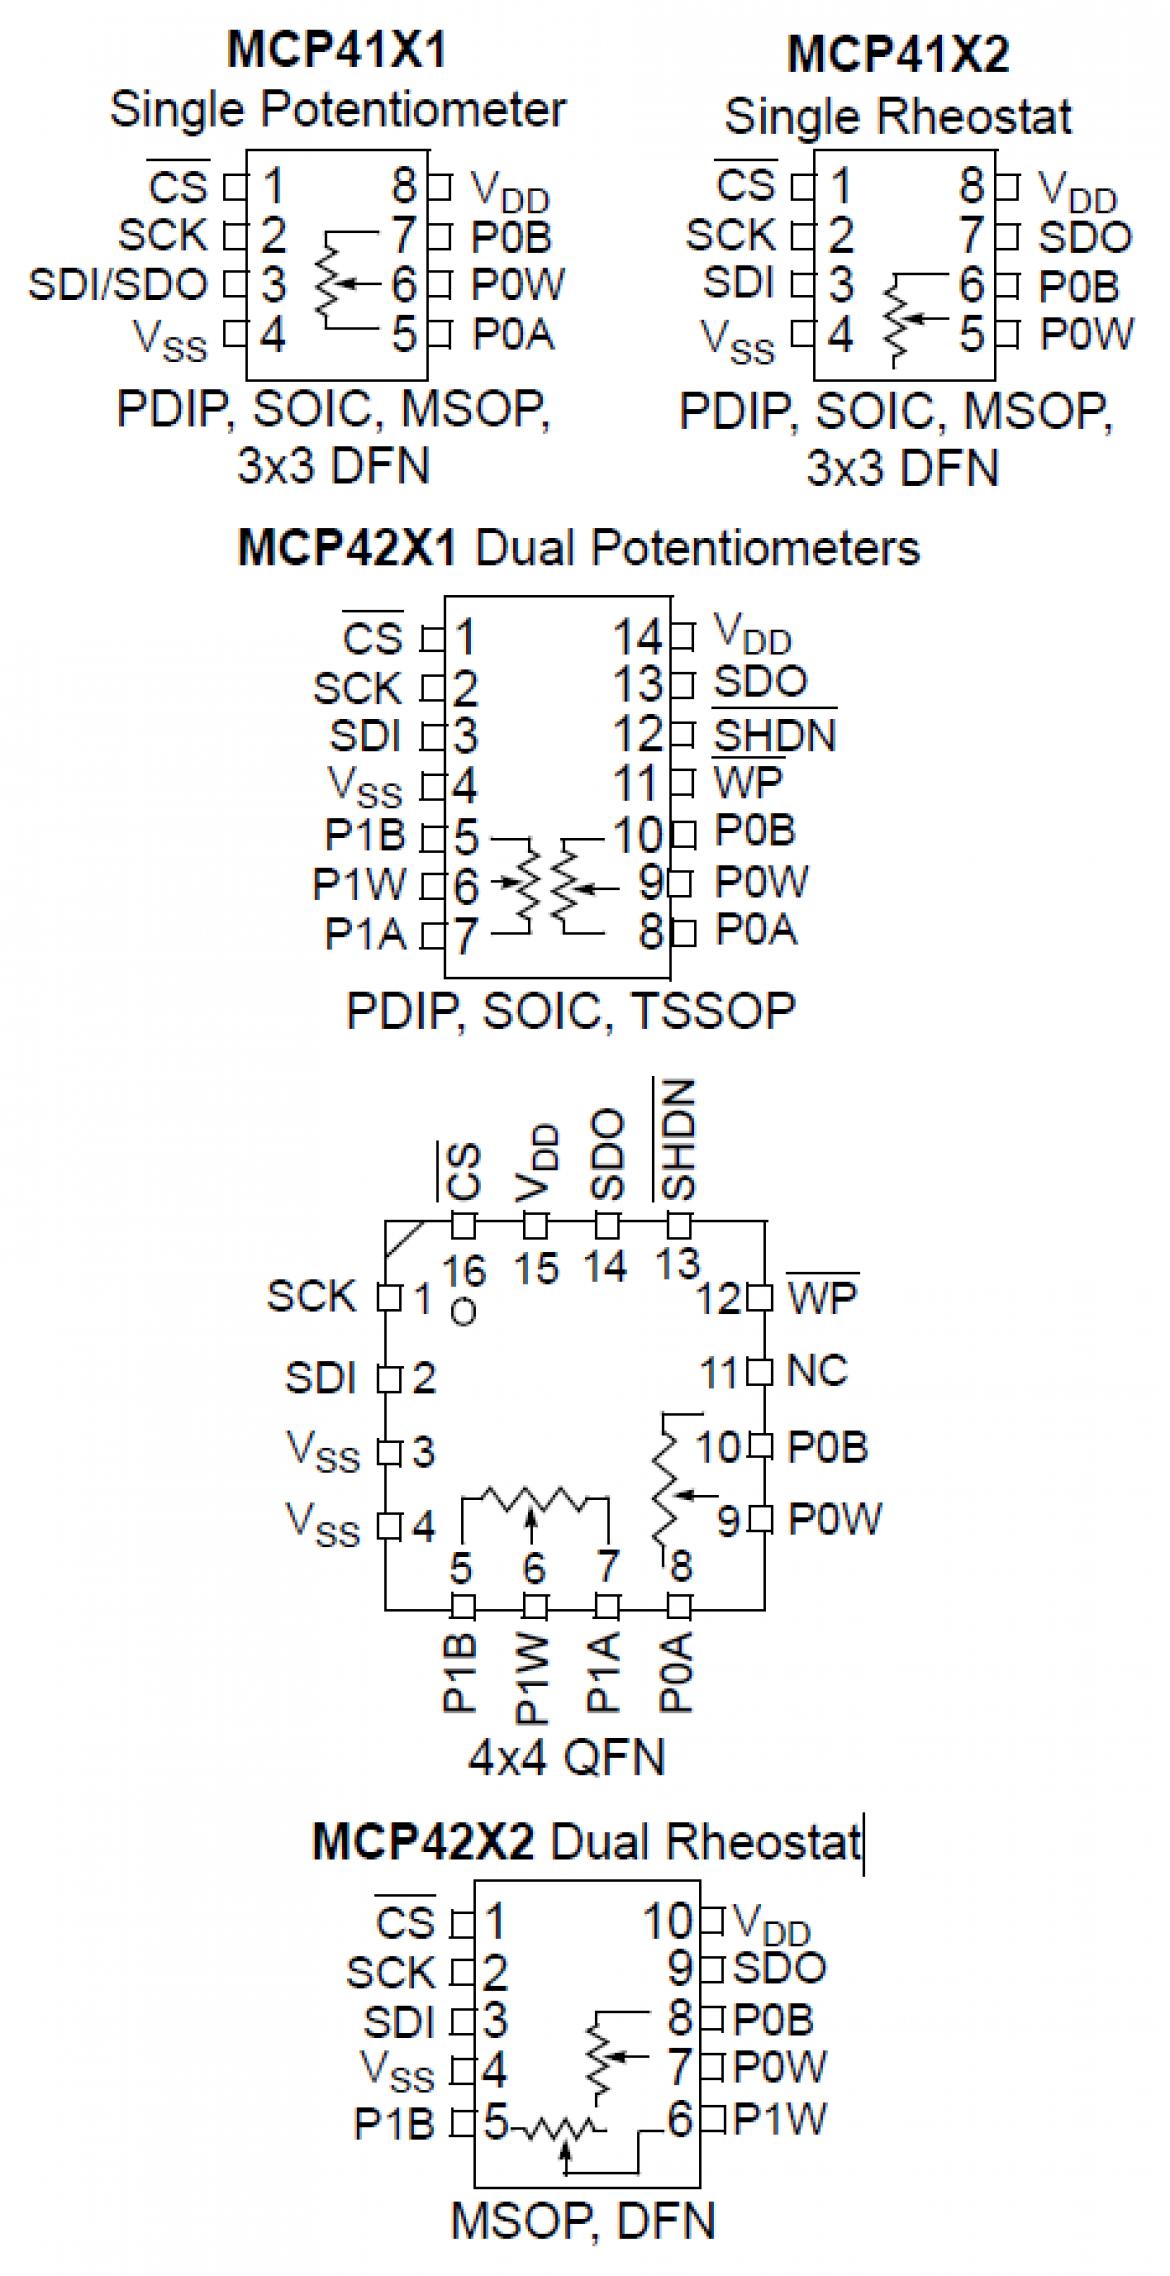 MPC422x/MCP426x パッケージタイプ